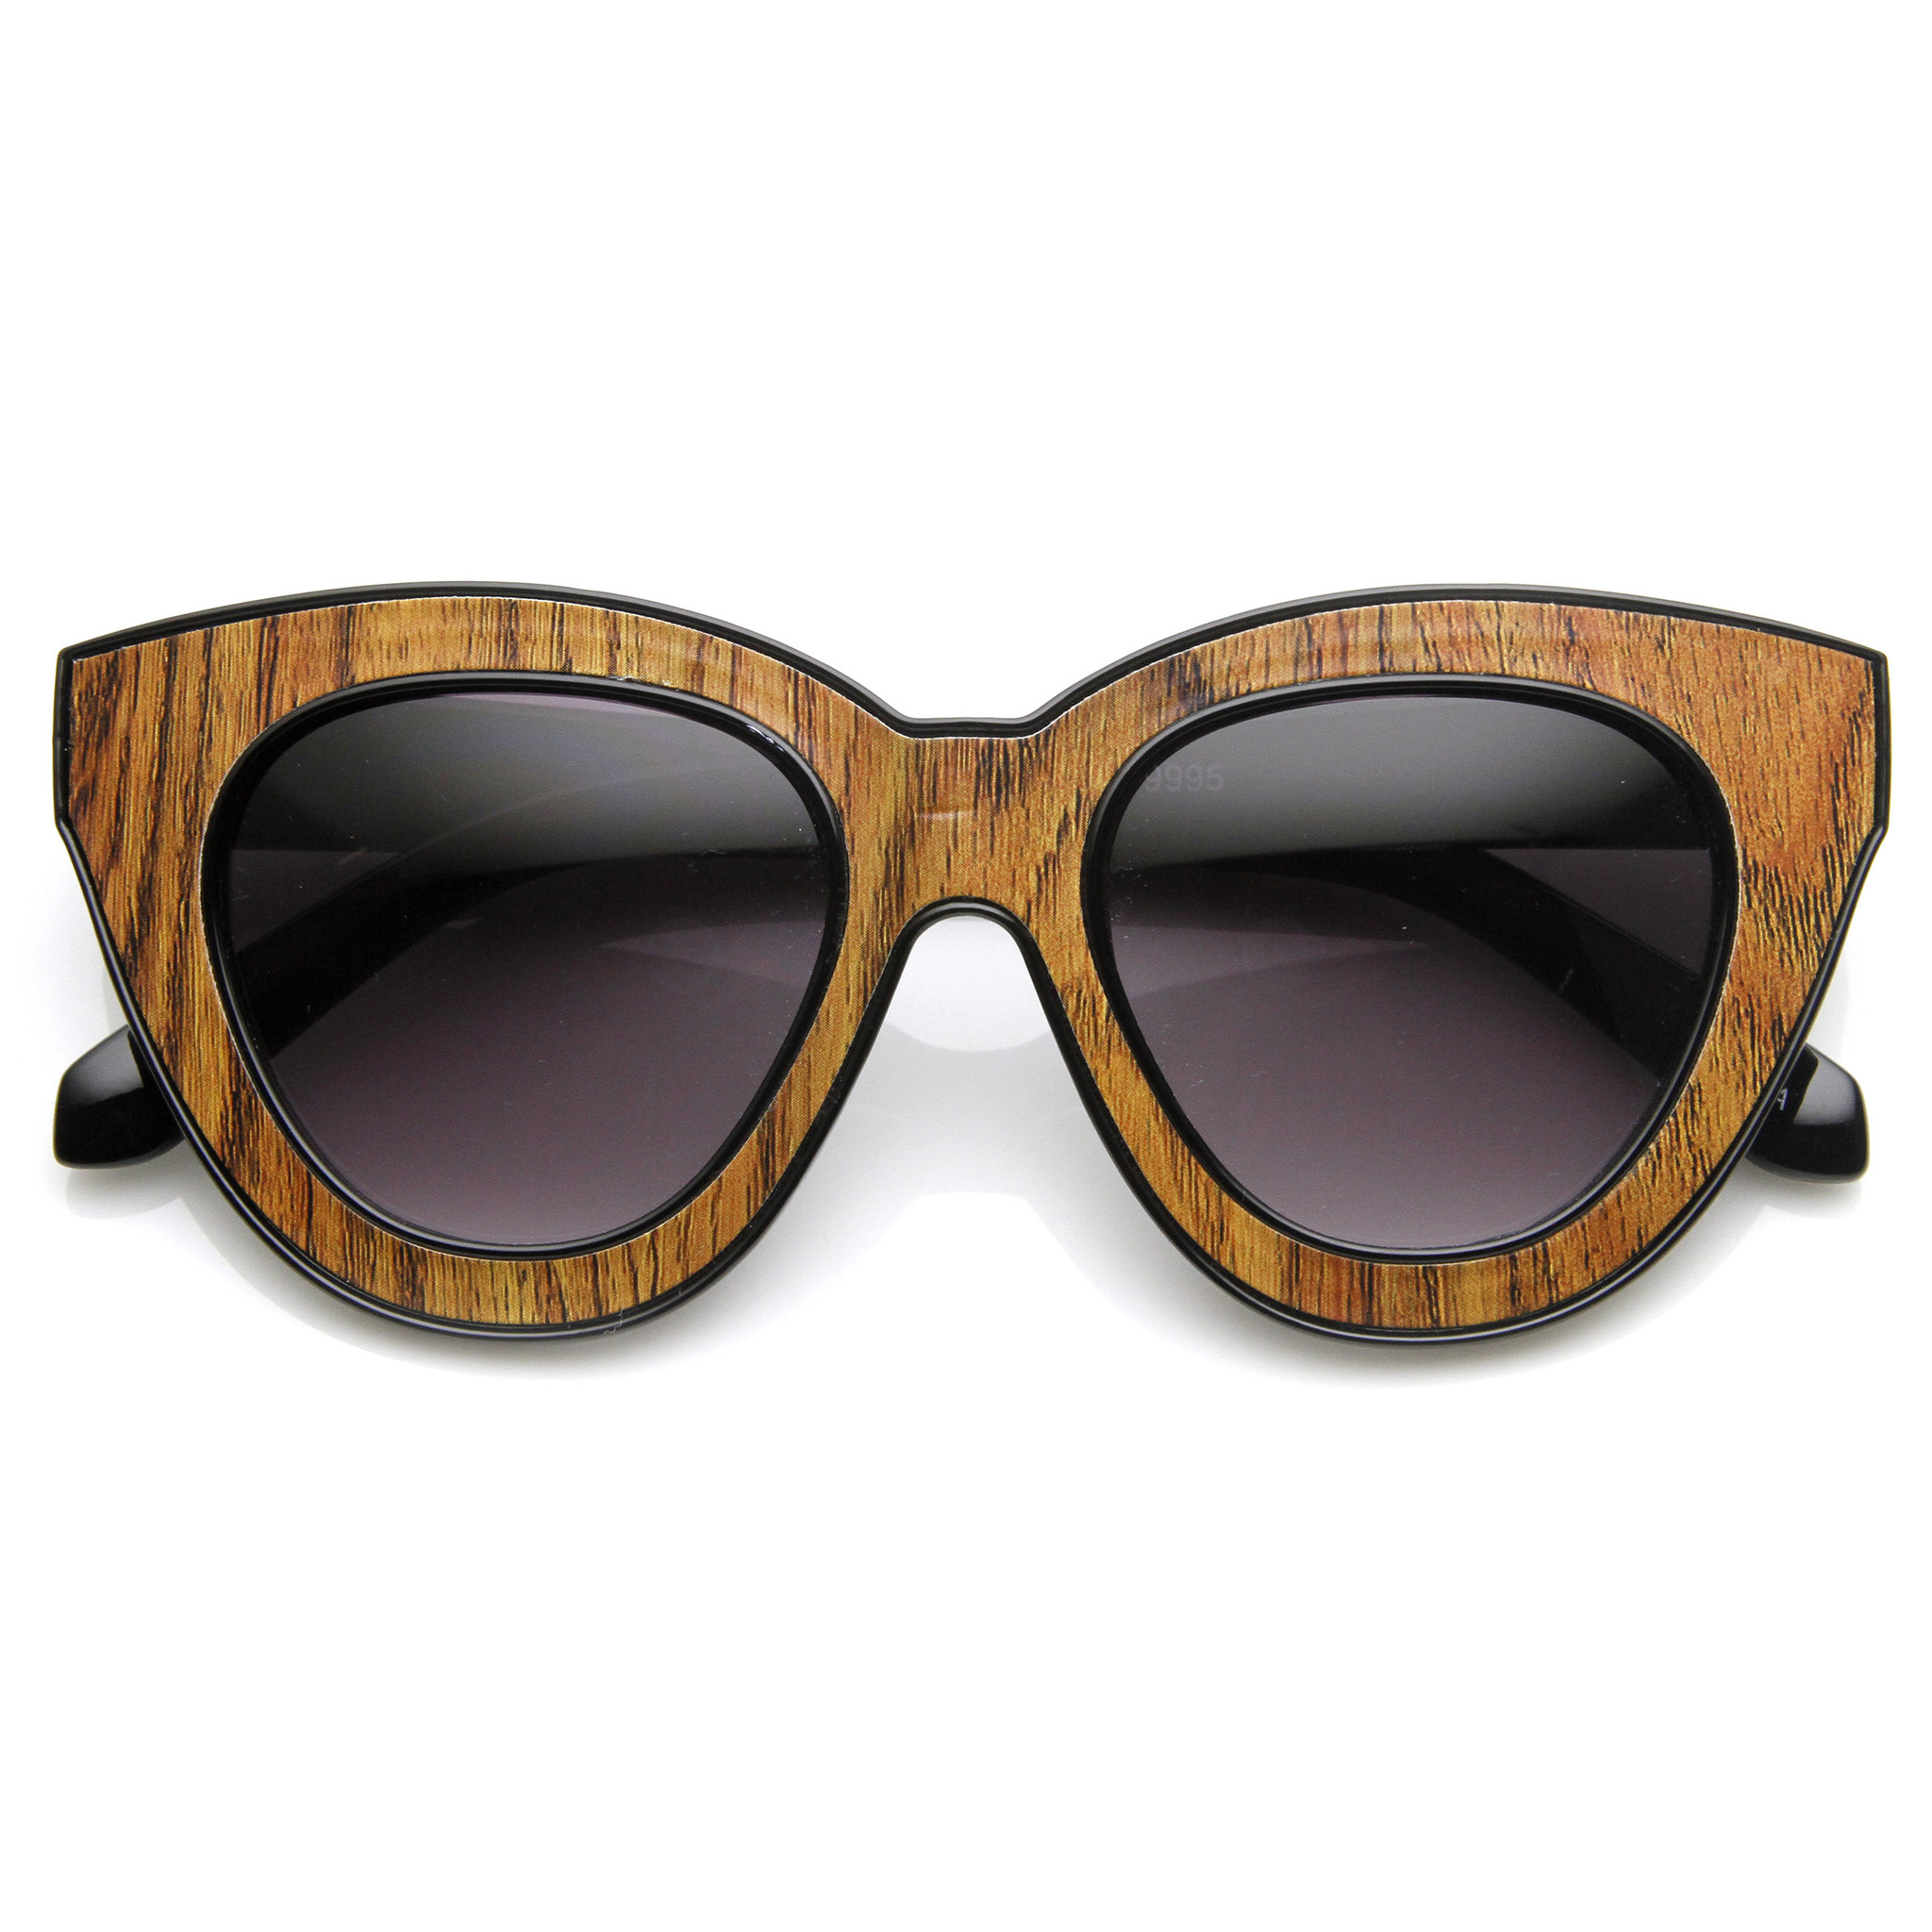 Indie Trendy Womens Block Cut Oversize Cat Eye Sunglasses 9160